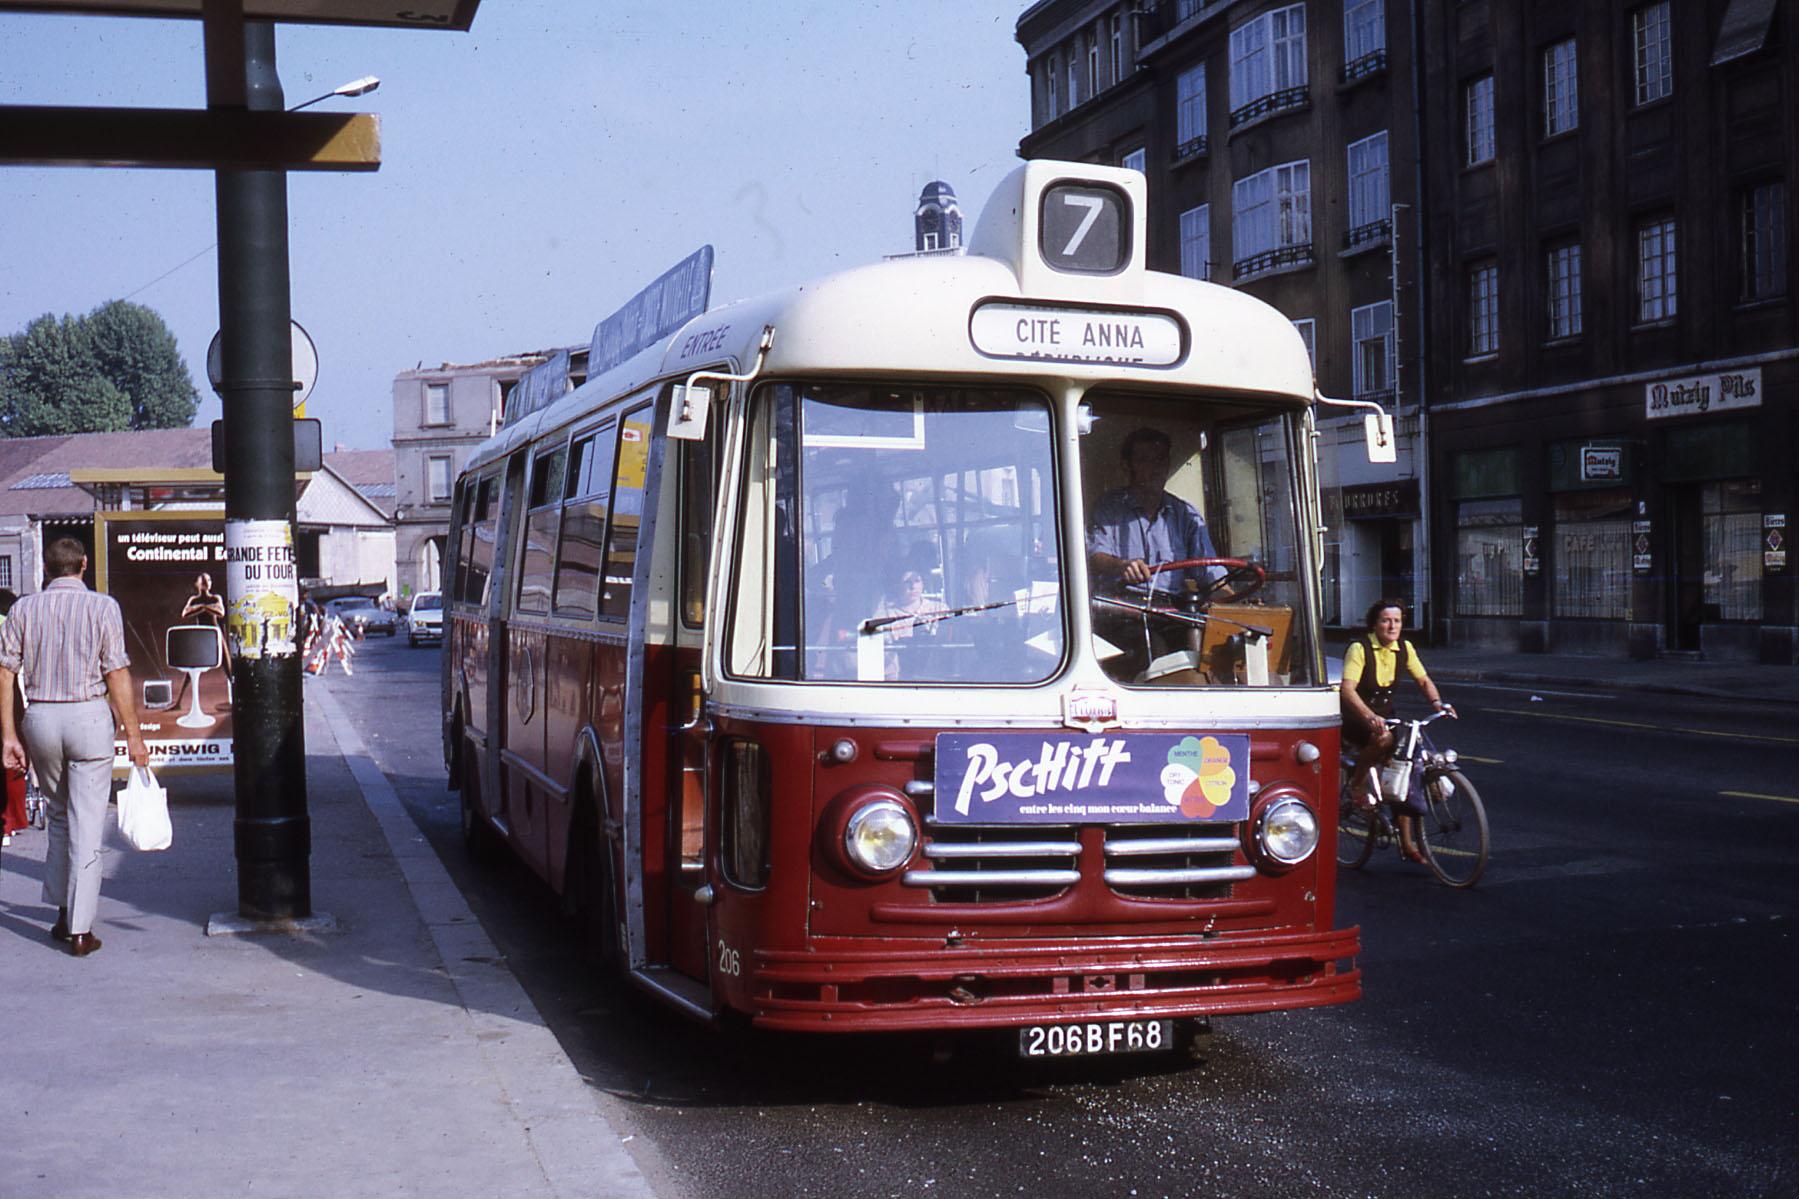 file tcm ligne 7 mulhouse bus wikimedia commons. Black Bedroom Furniture Sets. Home Design Ideas